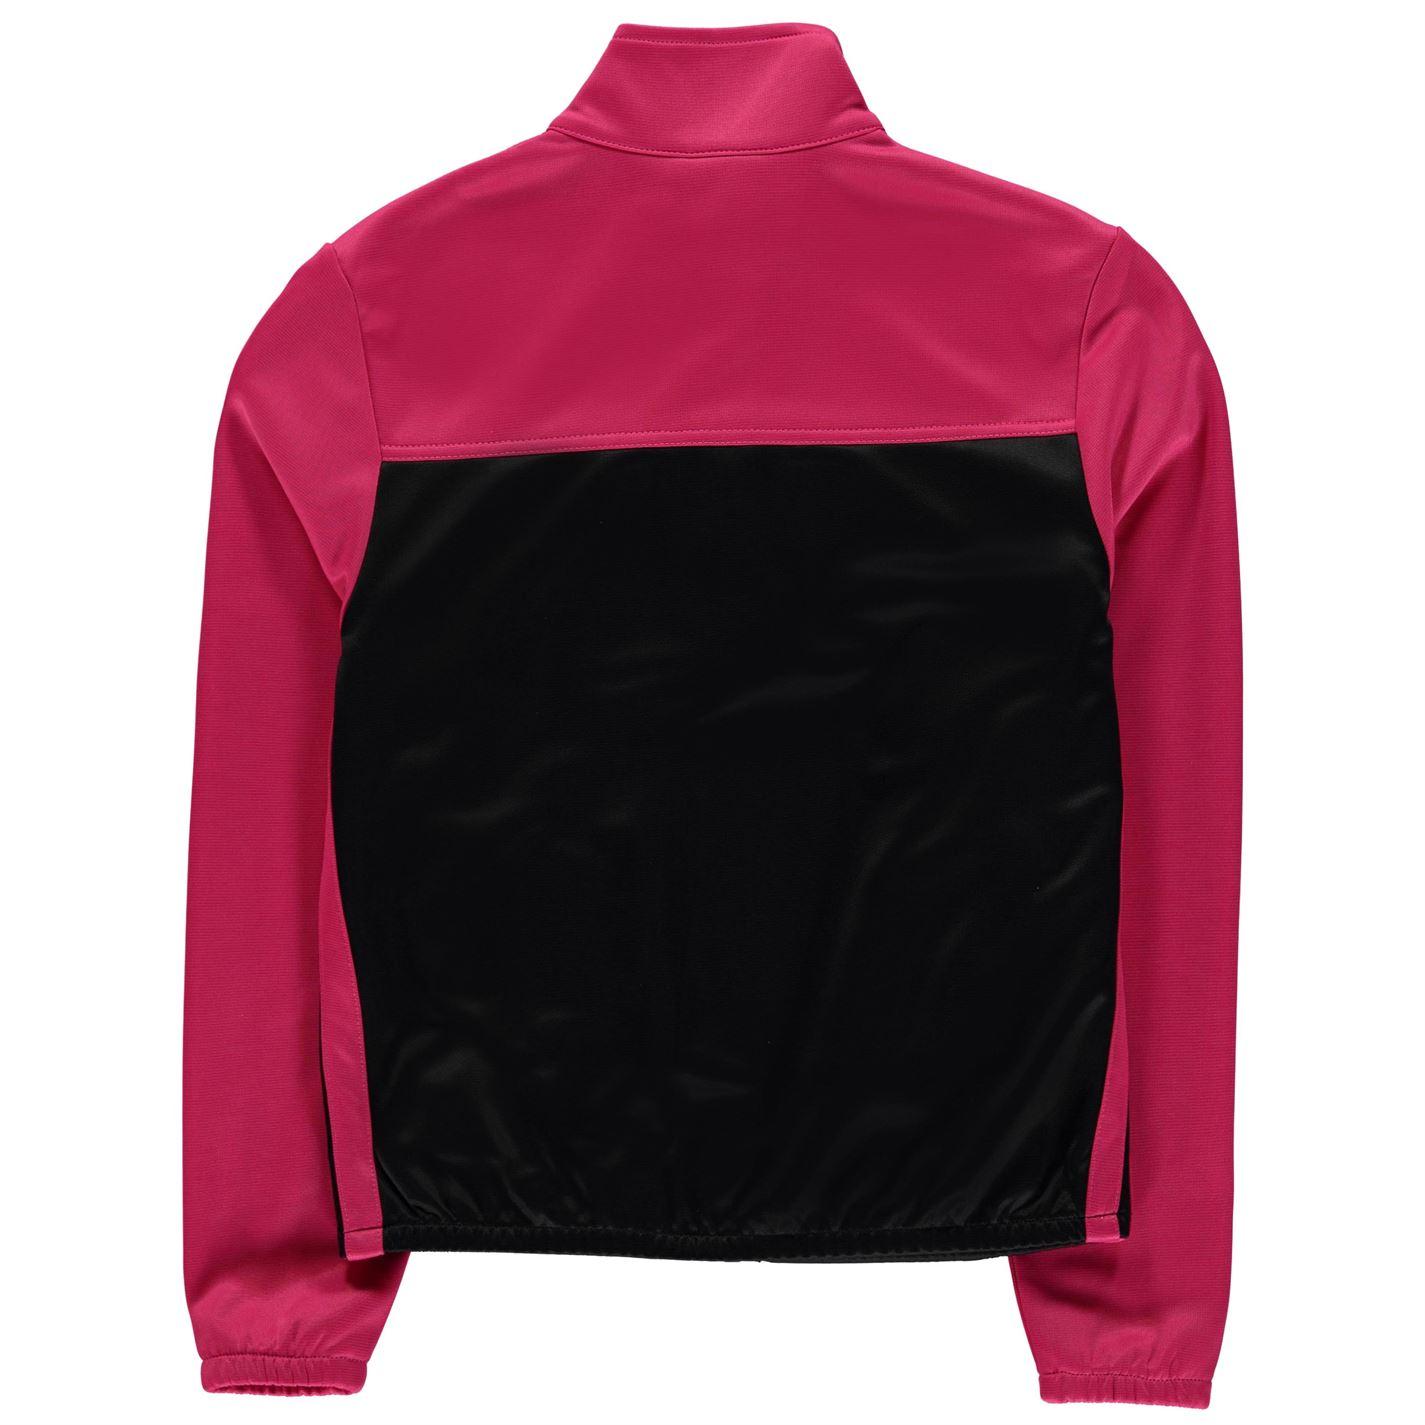 Lonsdale Kids Girls 2 Stripe Track Jacket Junior Tracksuit Top Coat ... 9351e0b3c3